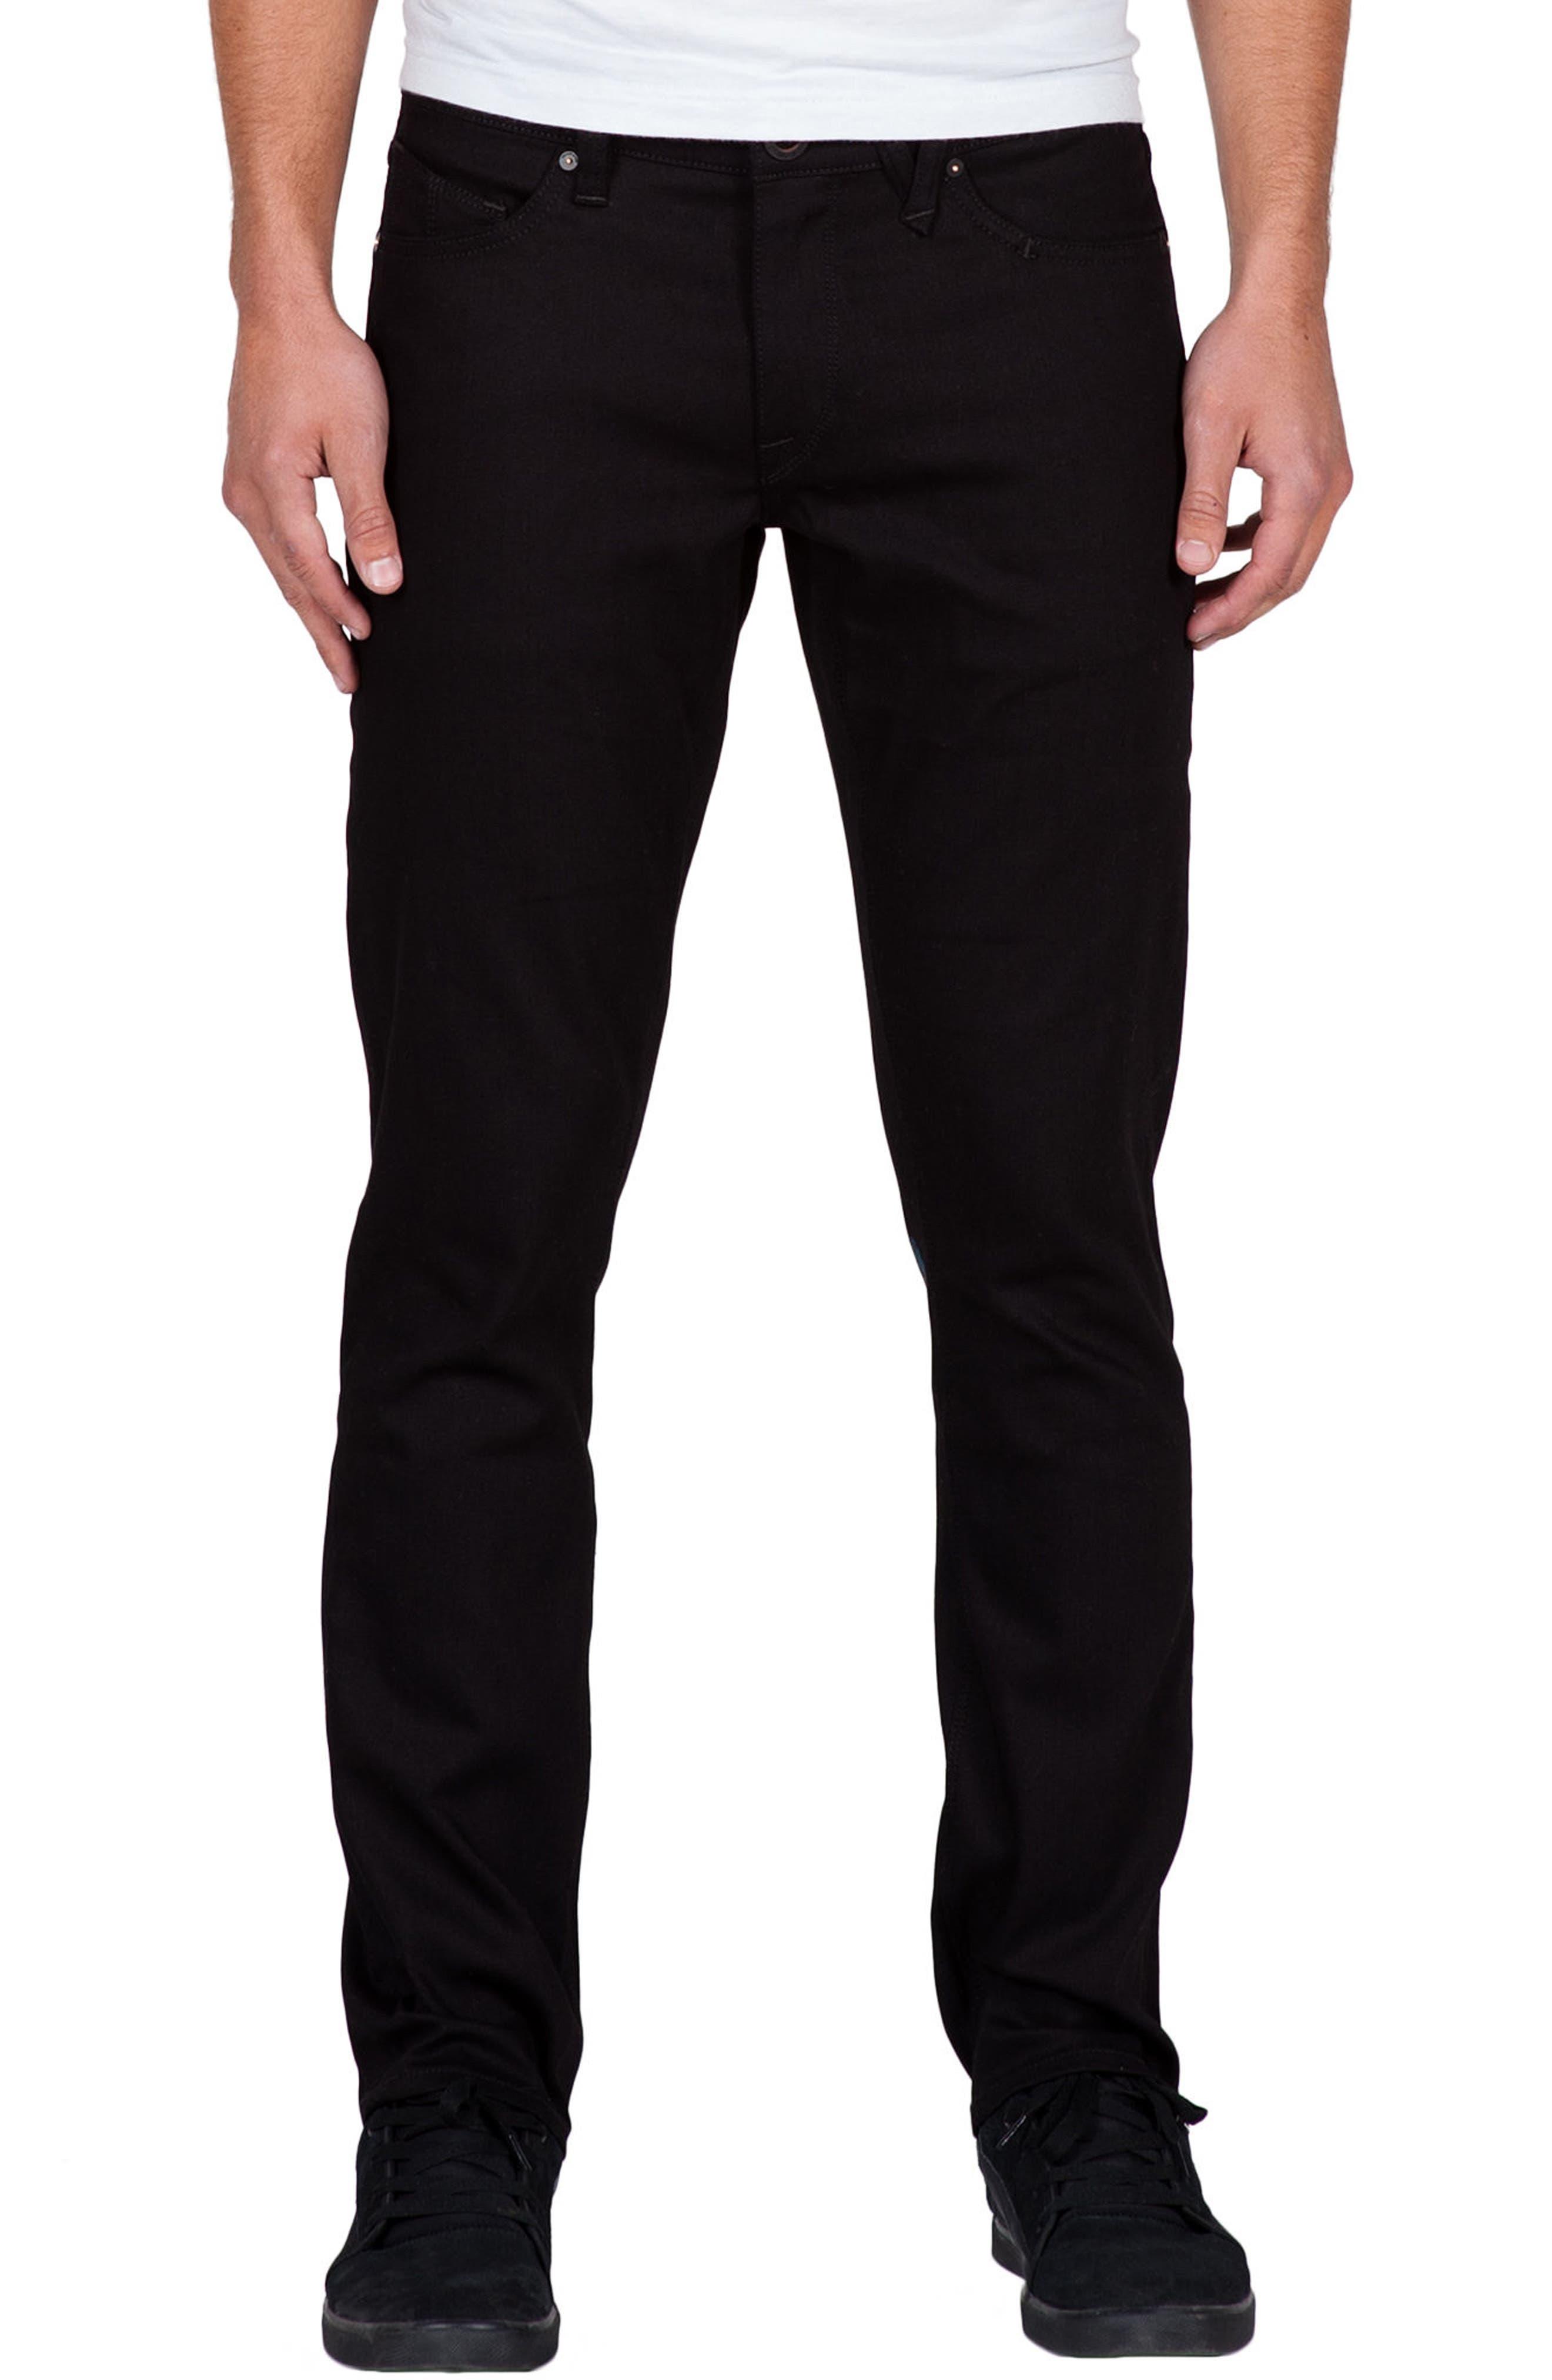 Main Image - Volcom Vorta Slim Fit Jeans